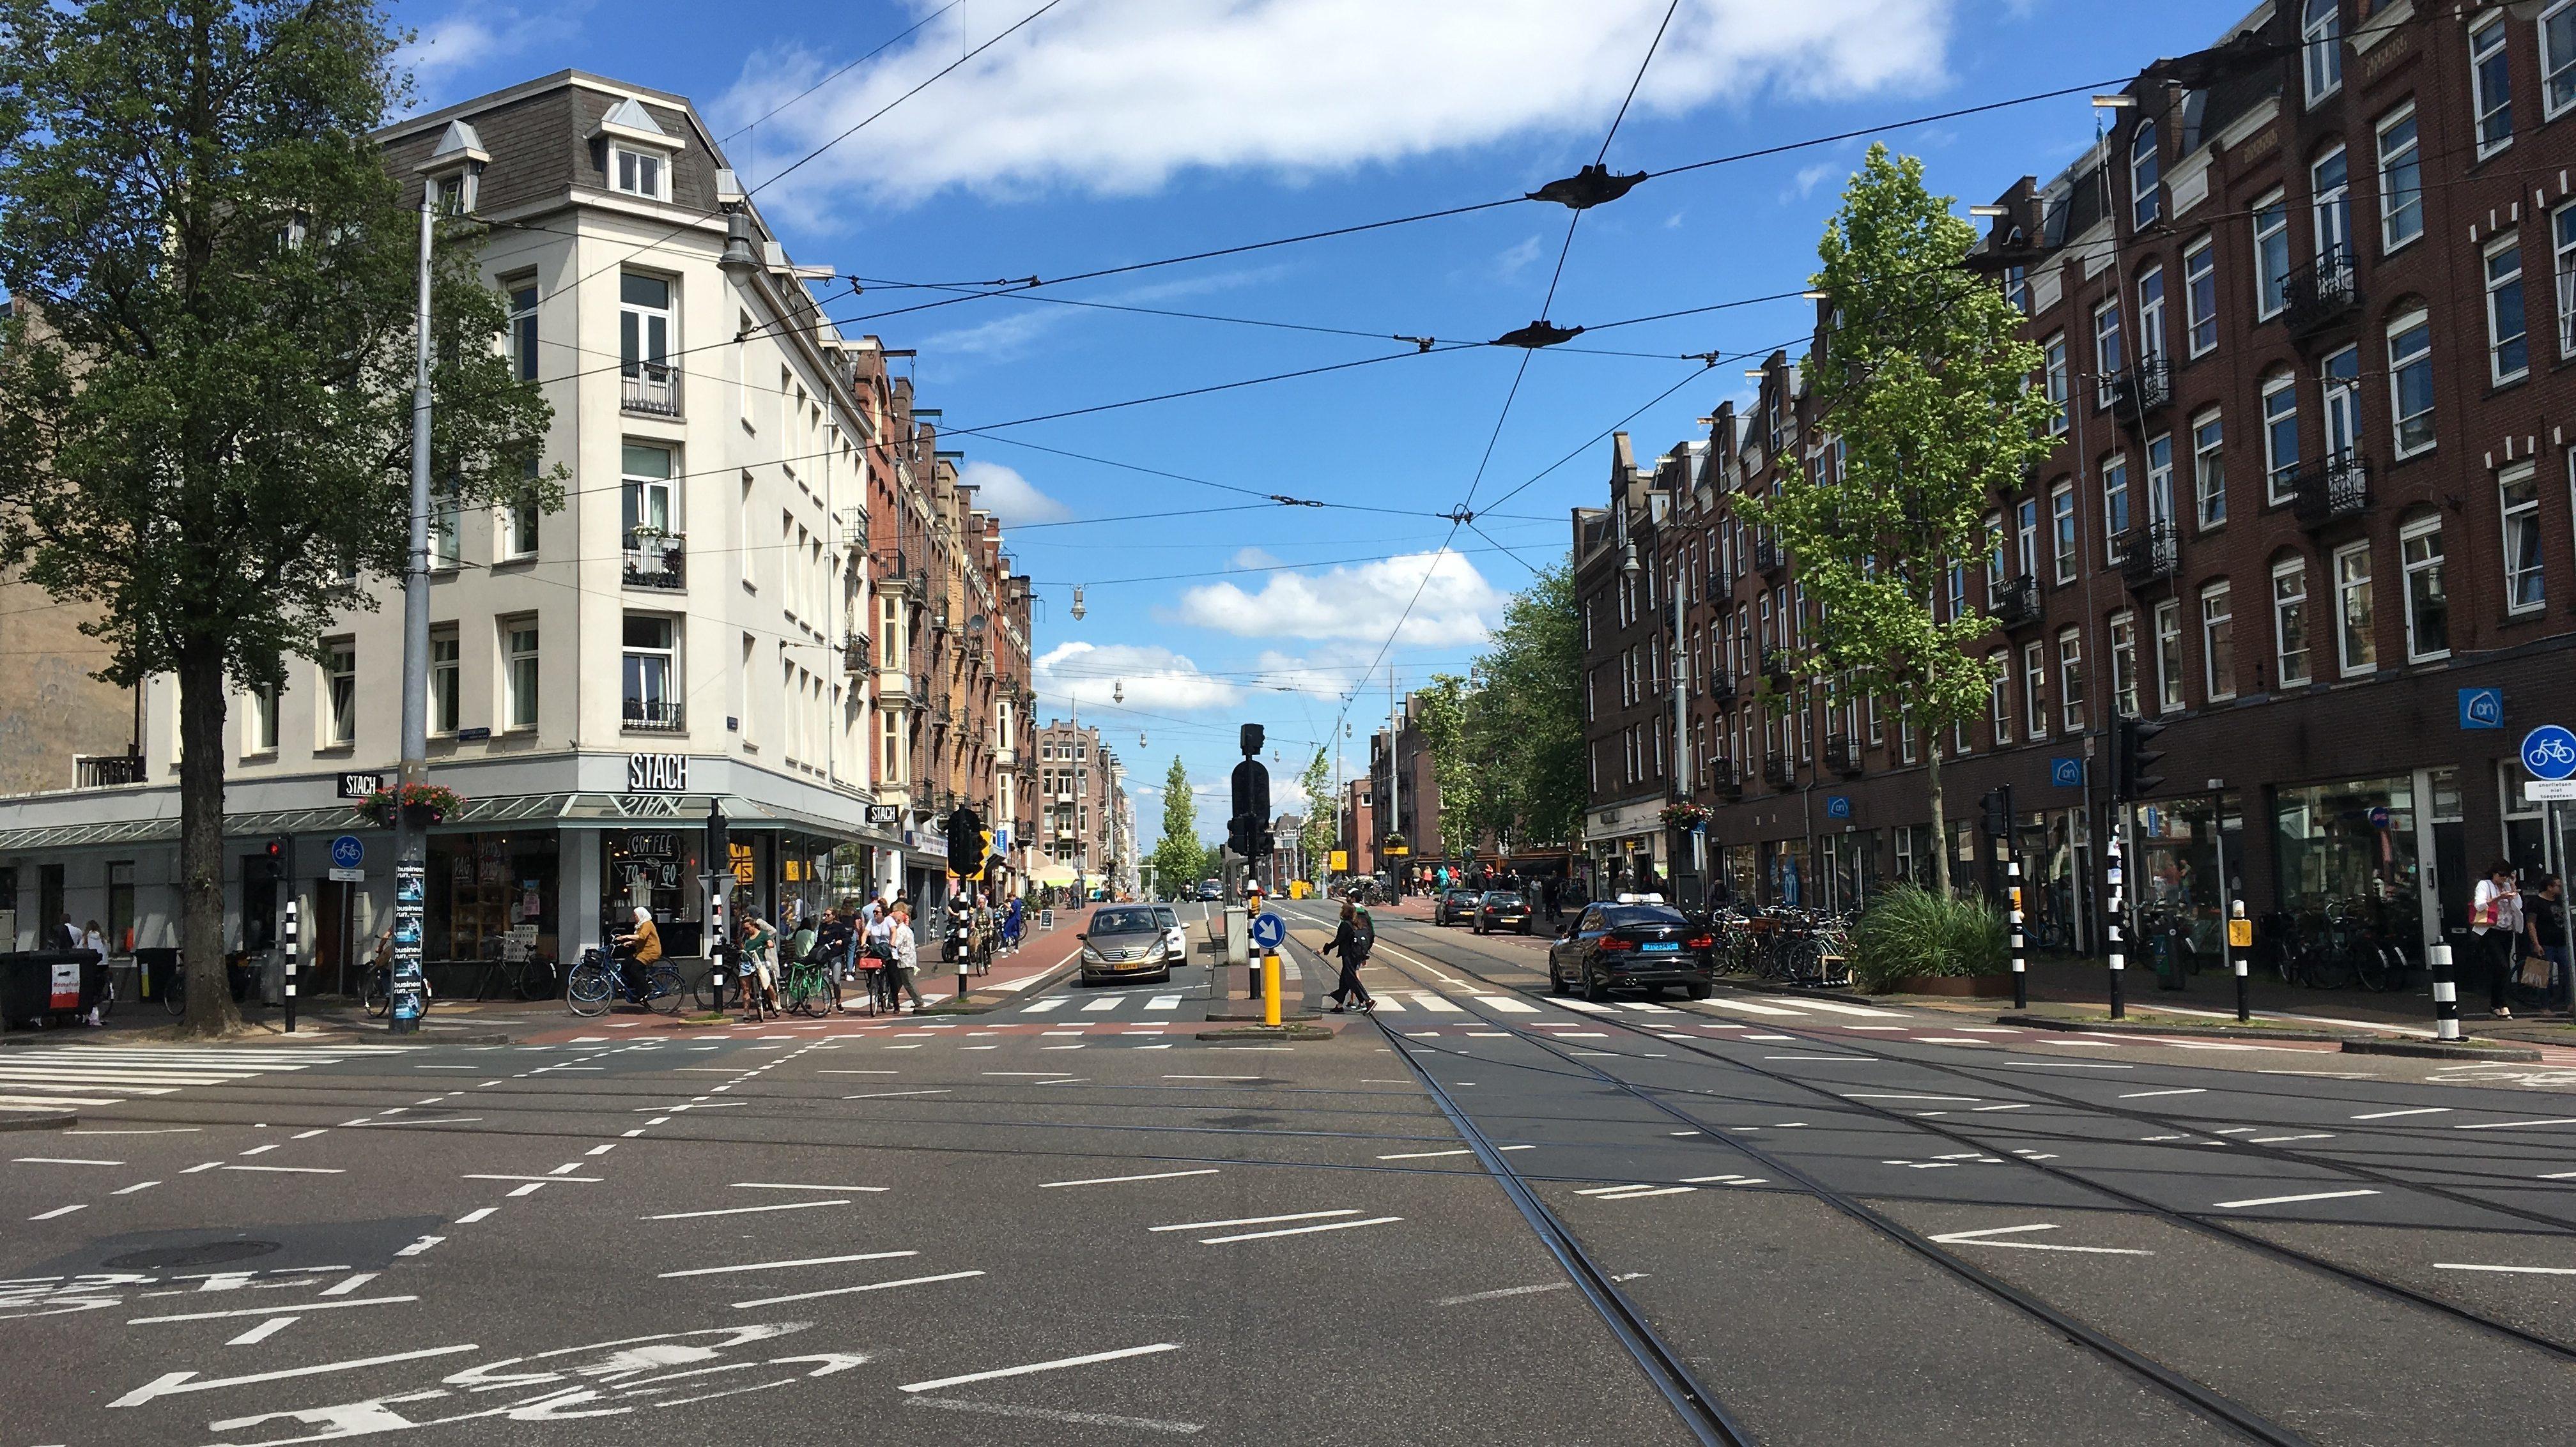 Kruising De Clercqstraat. Foto gemeente Amsterdam